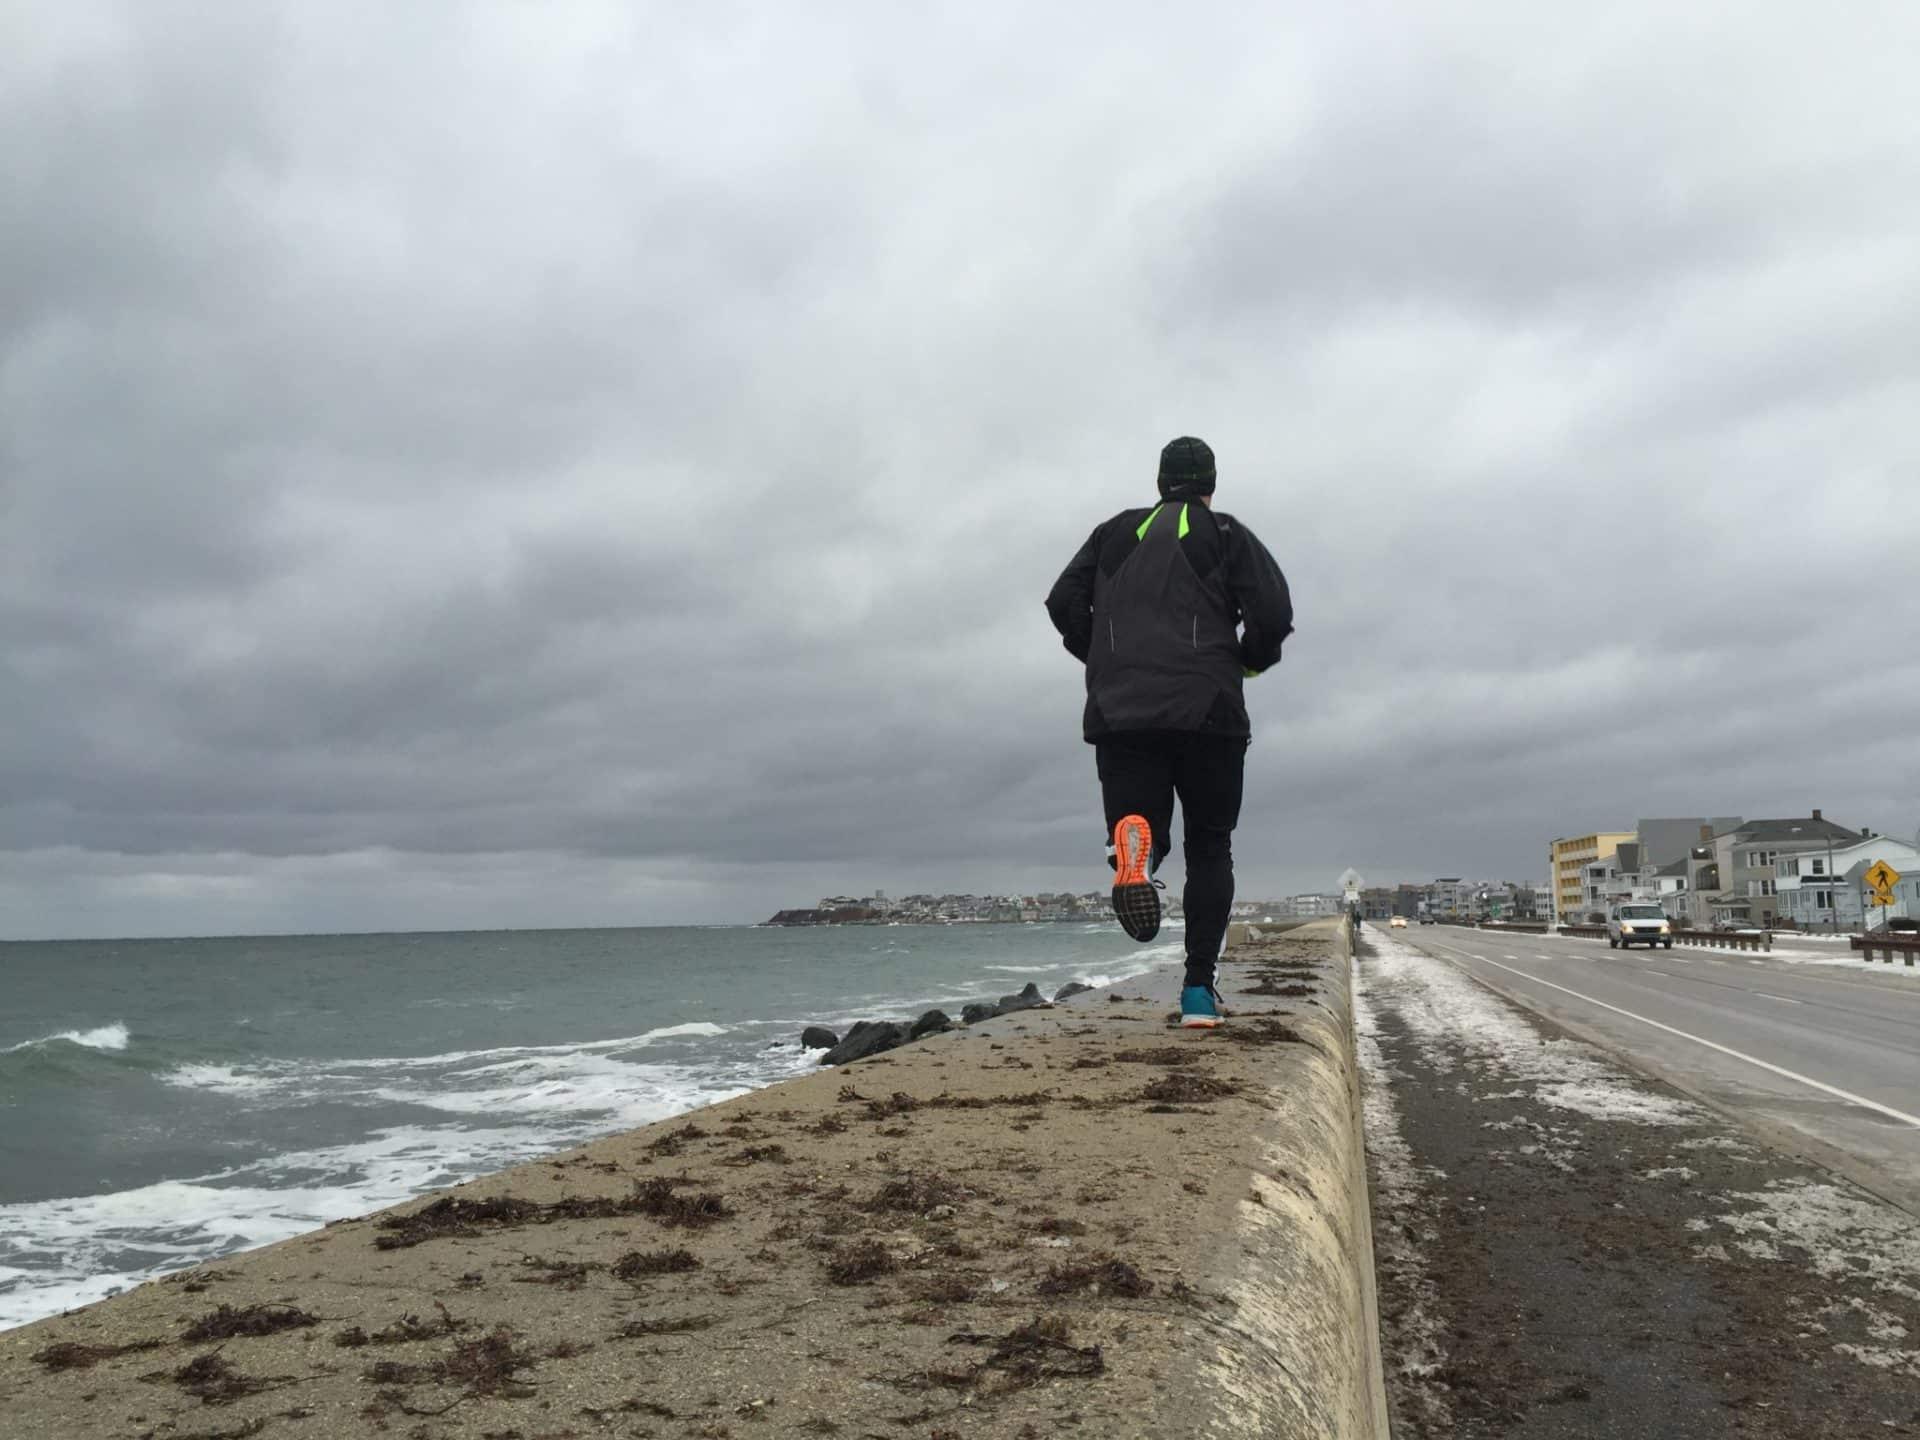 Runners Stories - Patrick